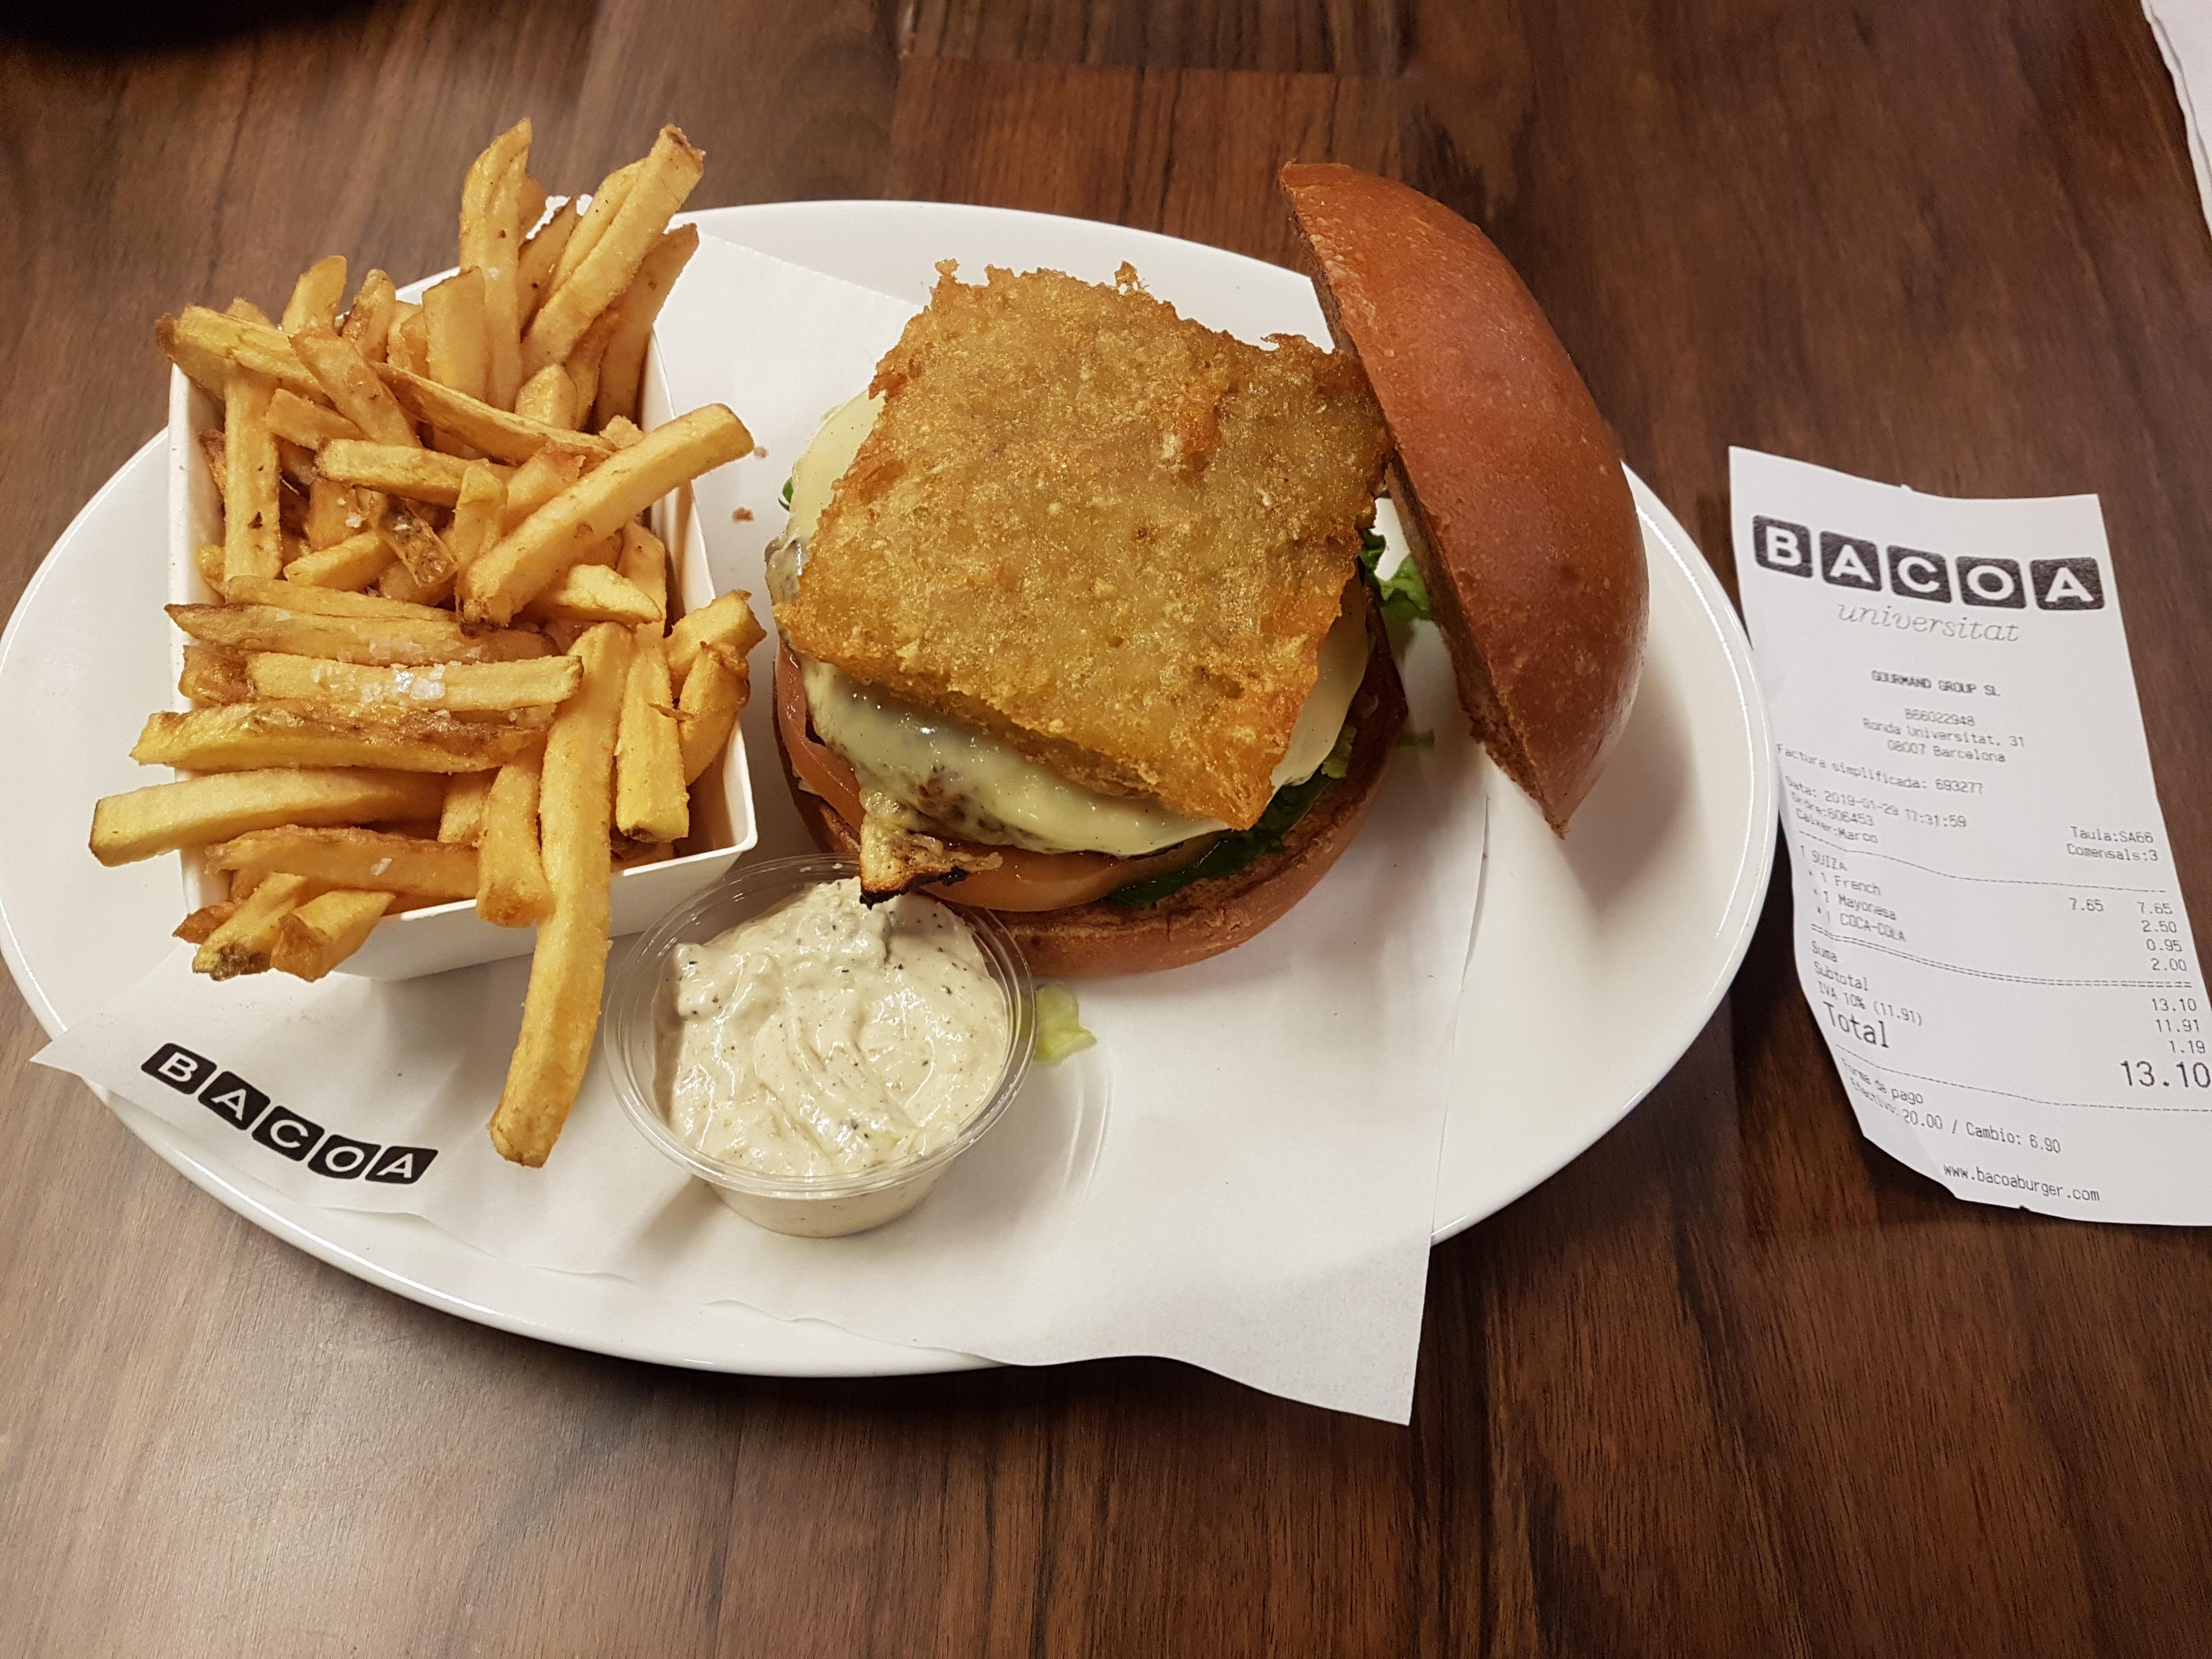 https://foodloader.net/Holz_2019-01-29_Bacoa_Roesti_Burger.jpg